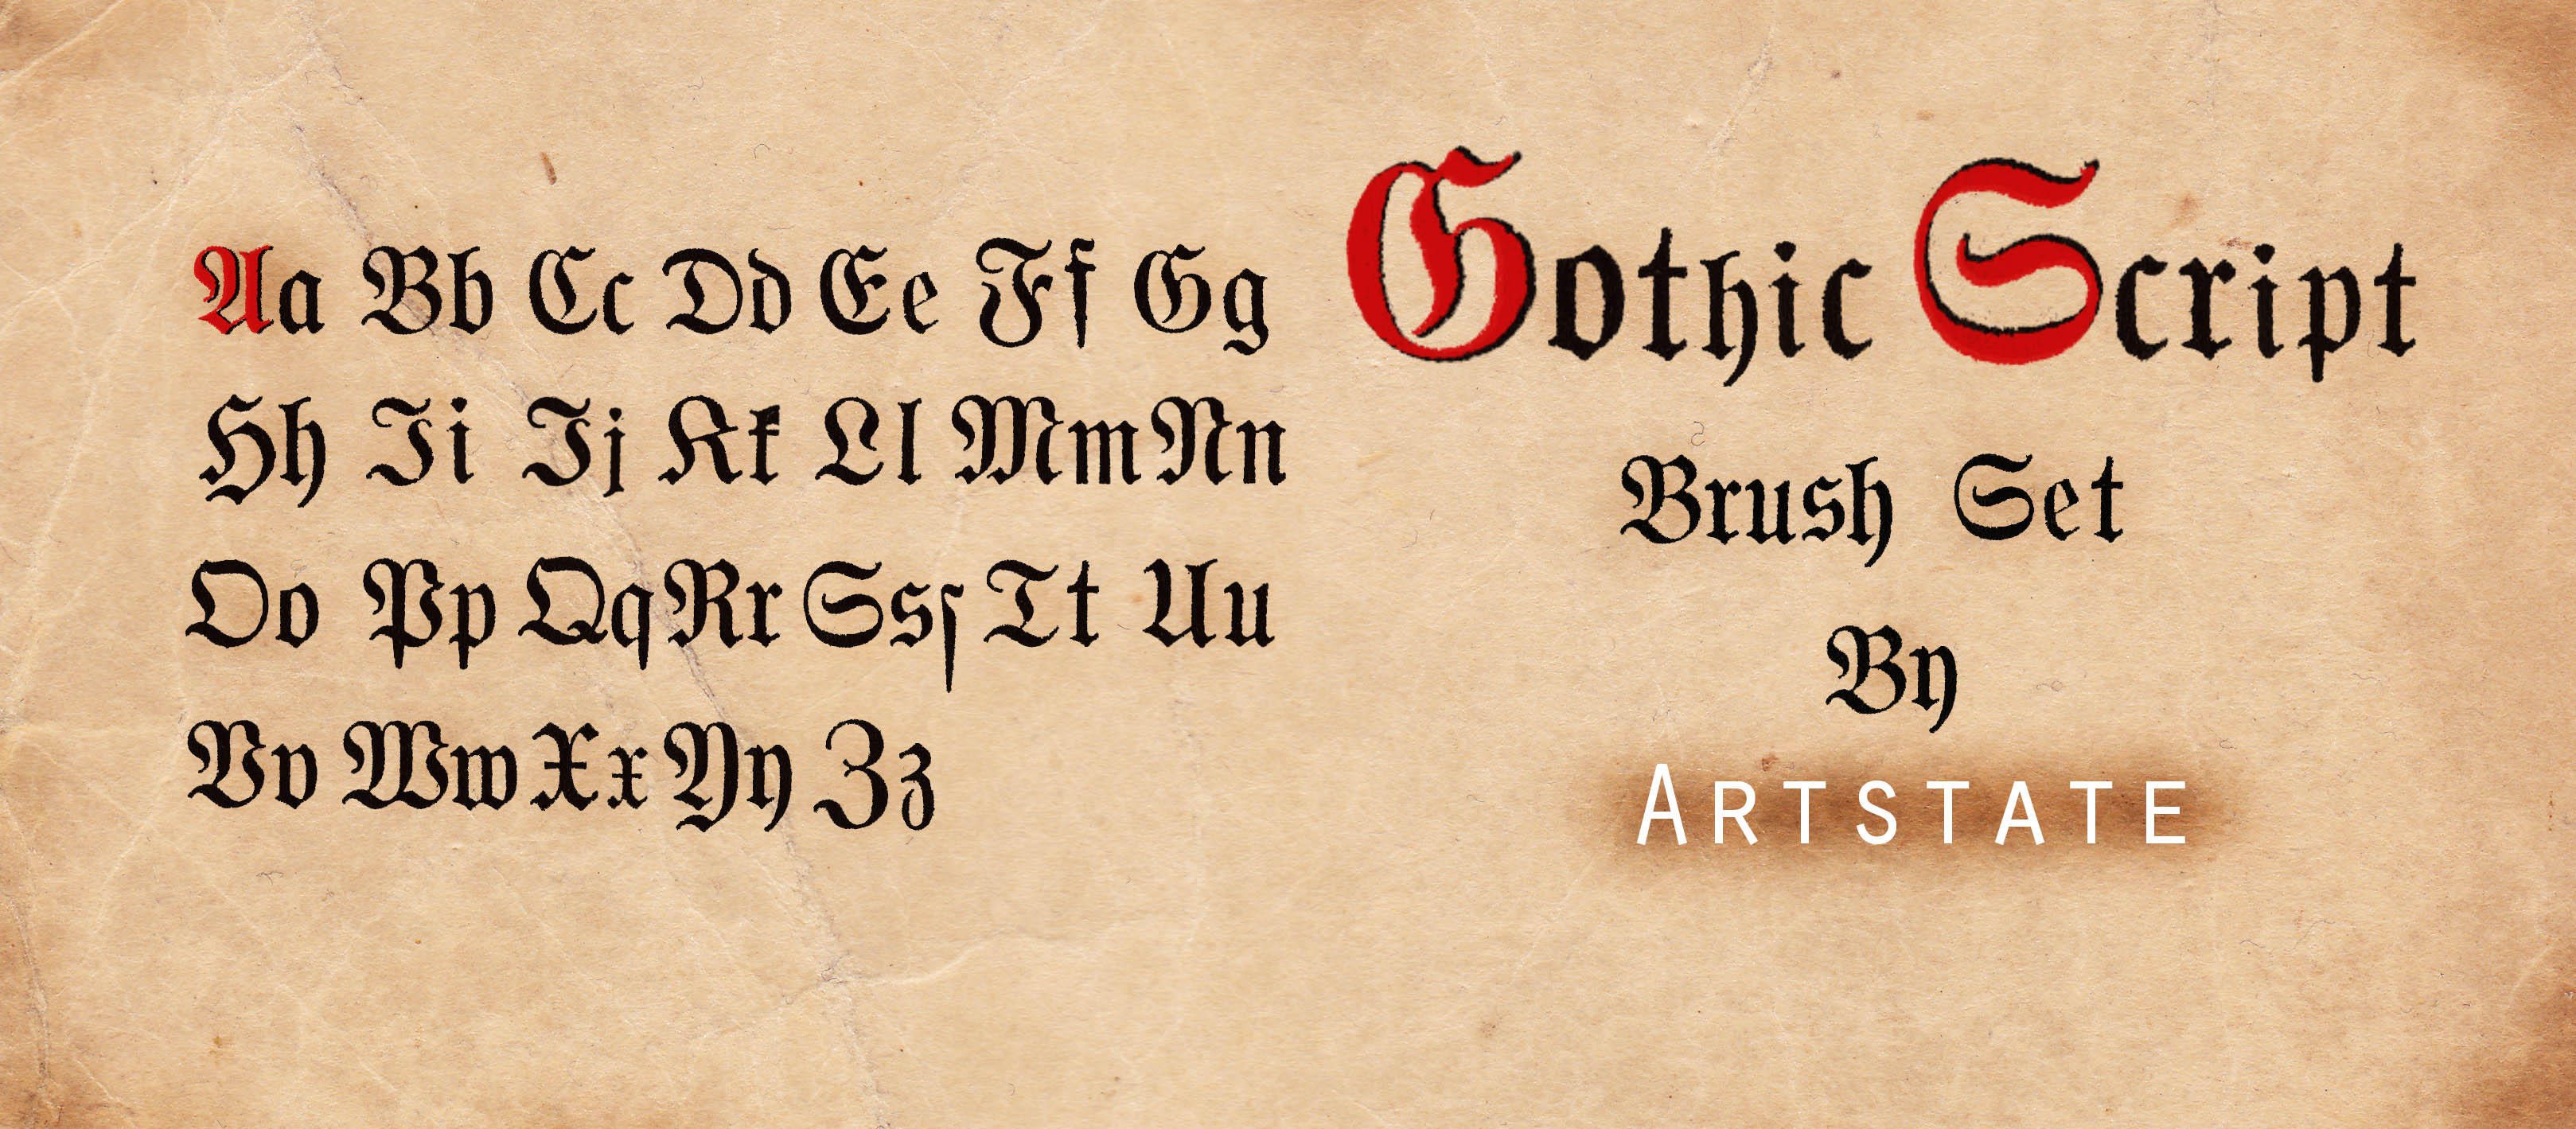 Gothic Script Brush Set by artstate